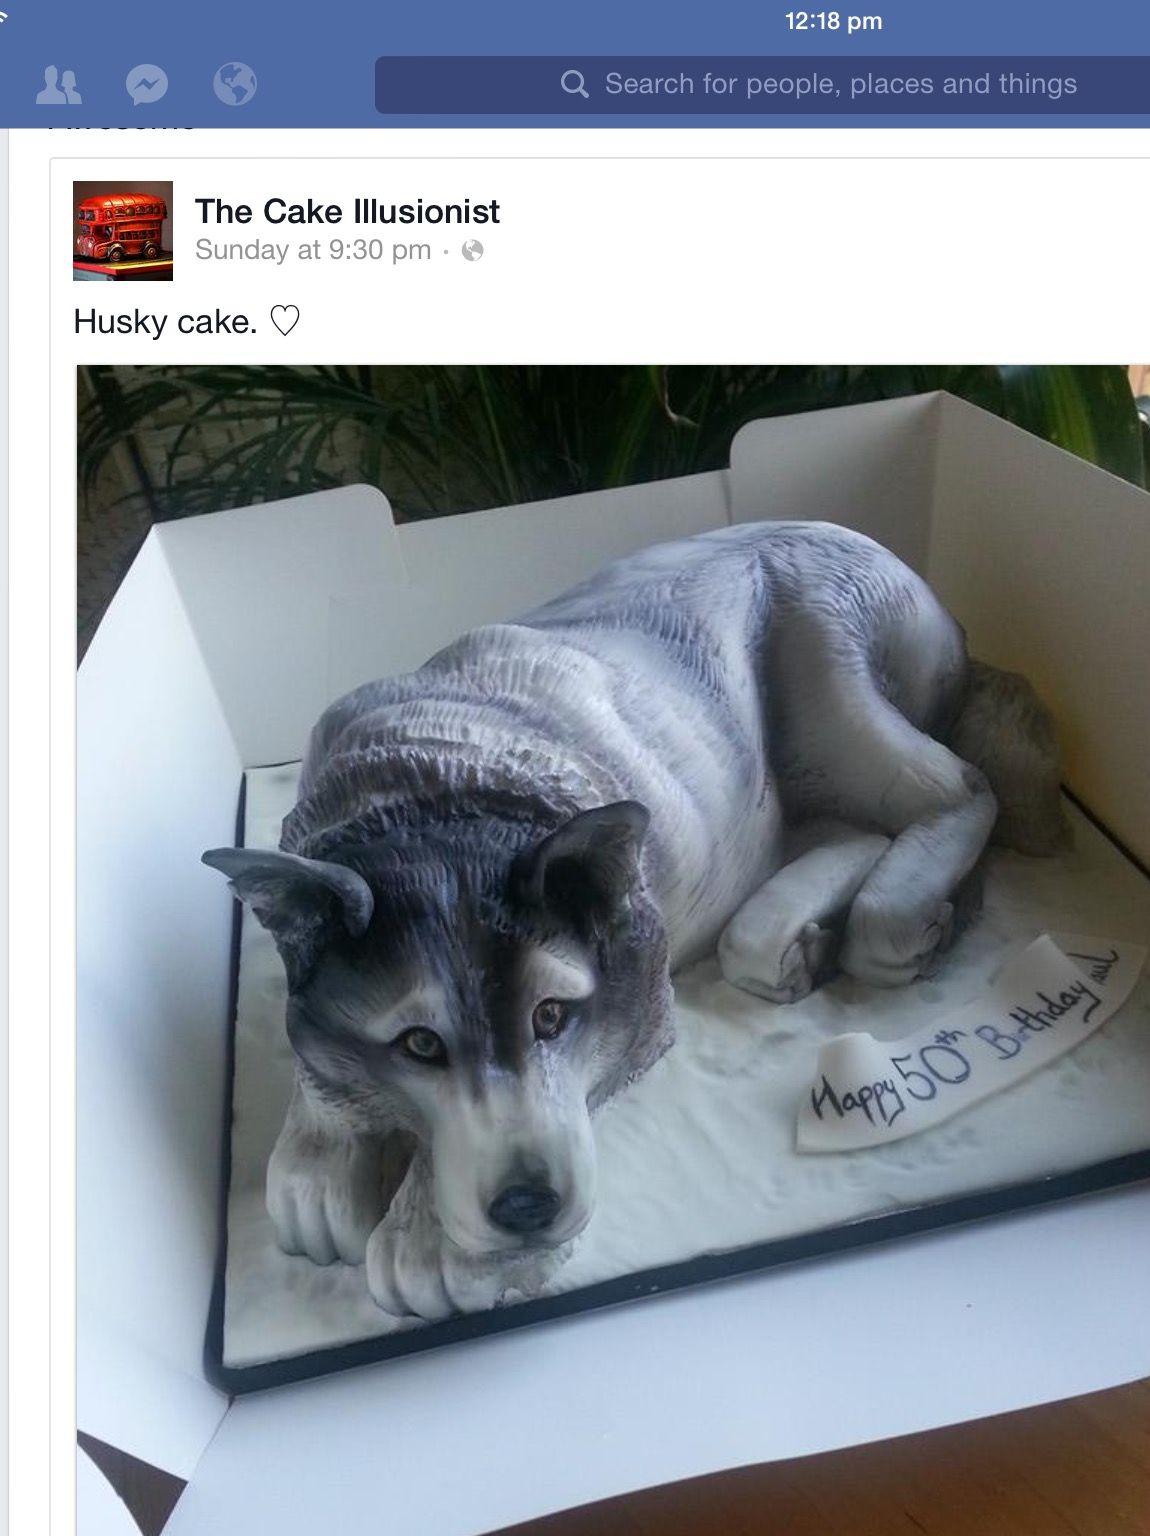 Pin Di Kriszta Csaszi Su Decorated Cakes Kulonleges Tortak Torte Incredibili Torte Animali